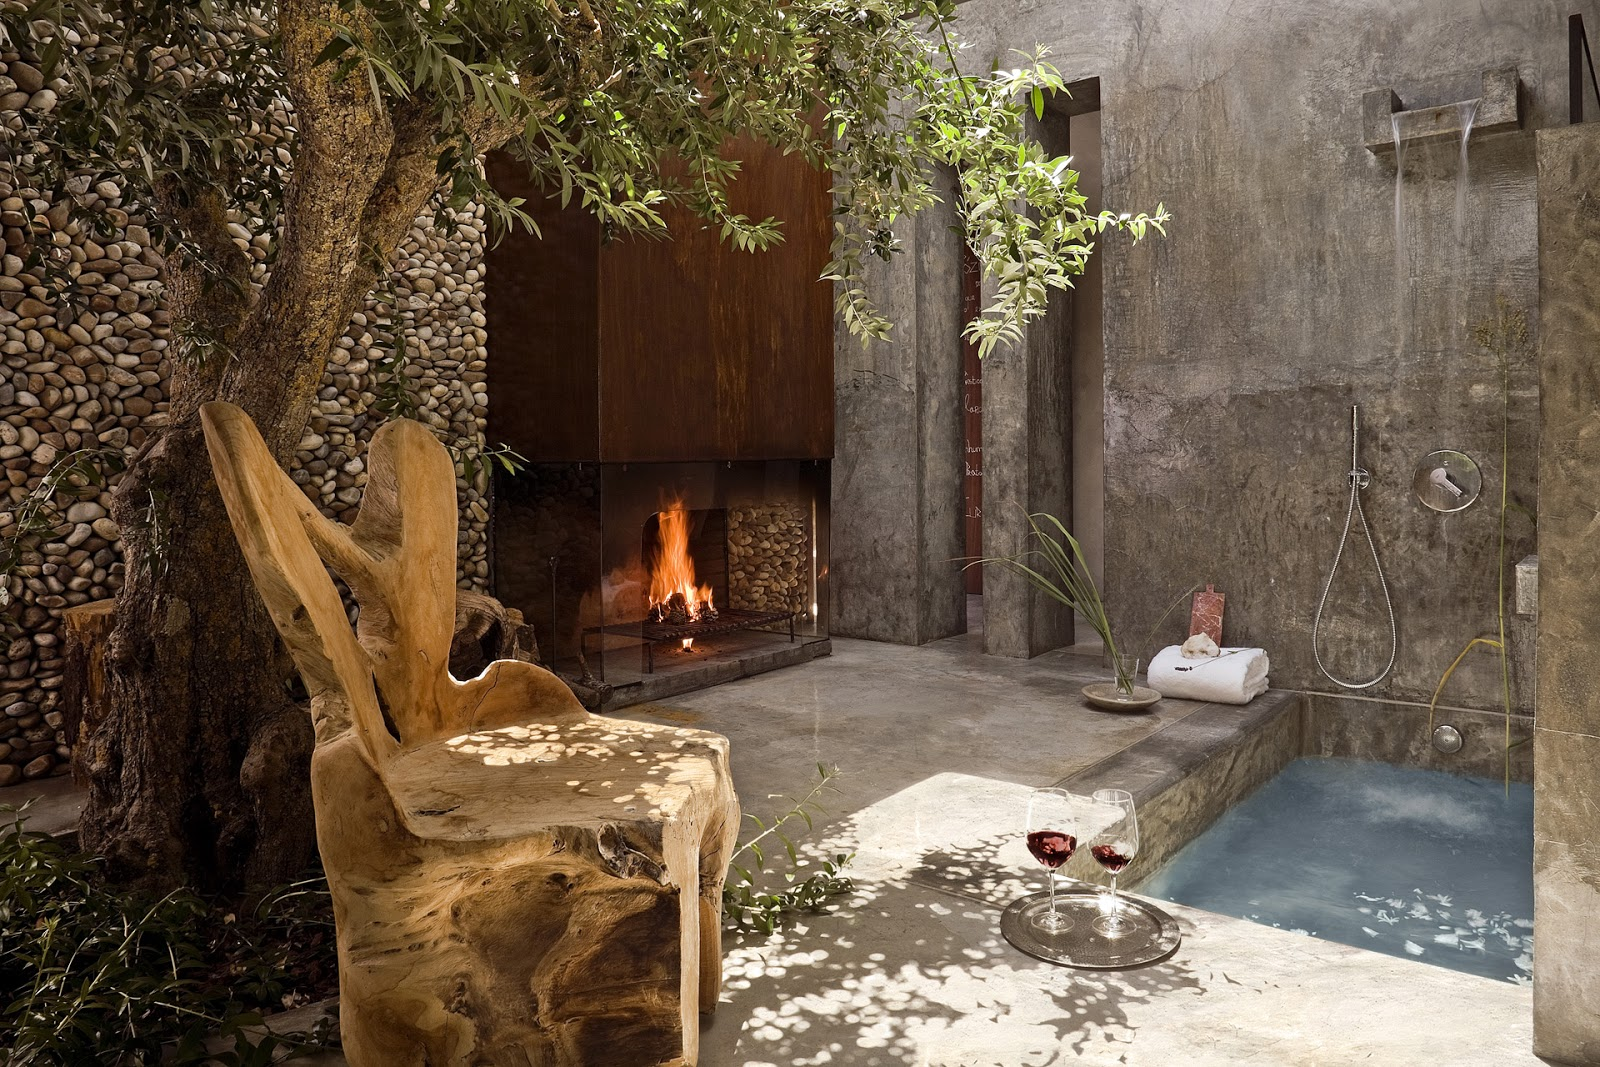 eco+style+holiday+luxury+areiasdoseixo+outside+pool++ethnicchic+cocomorocco+portugal